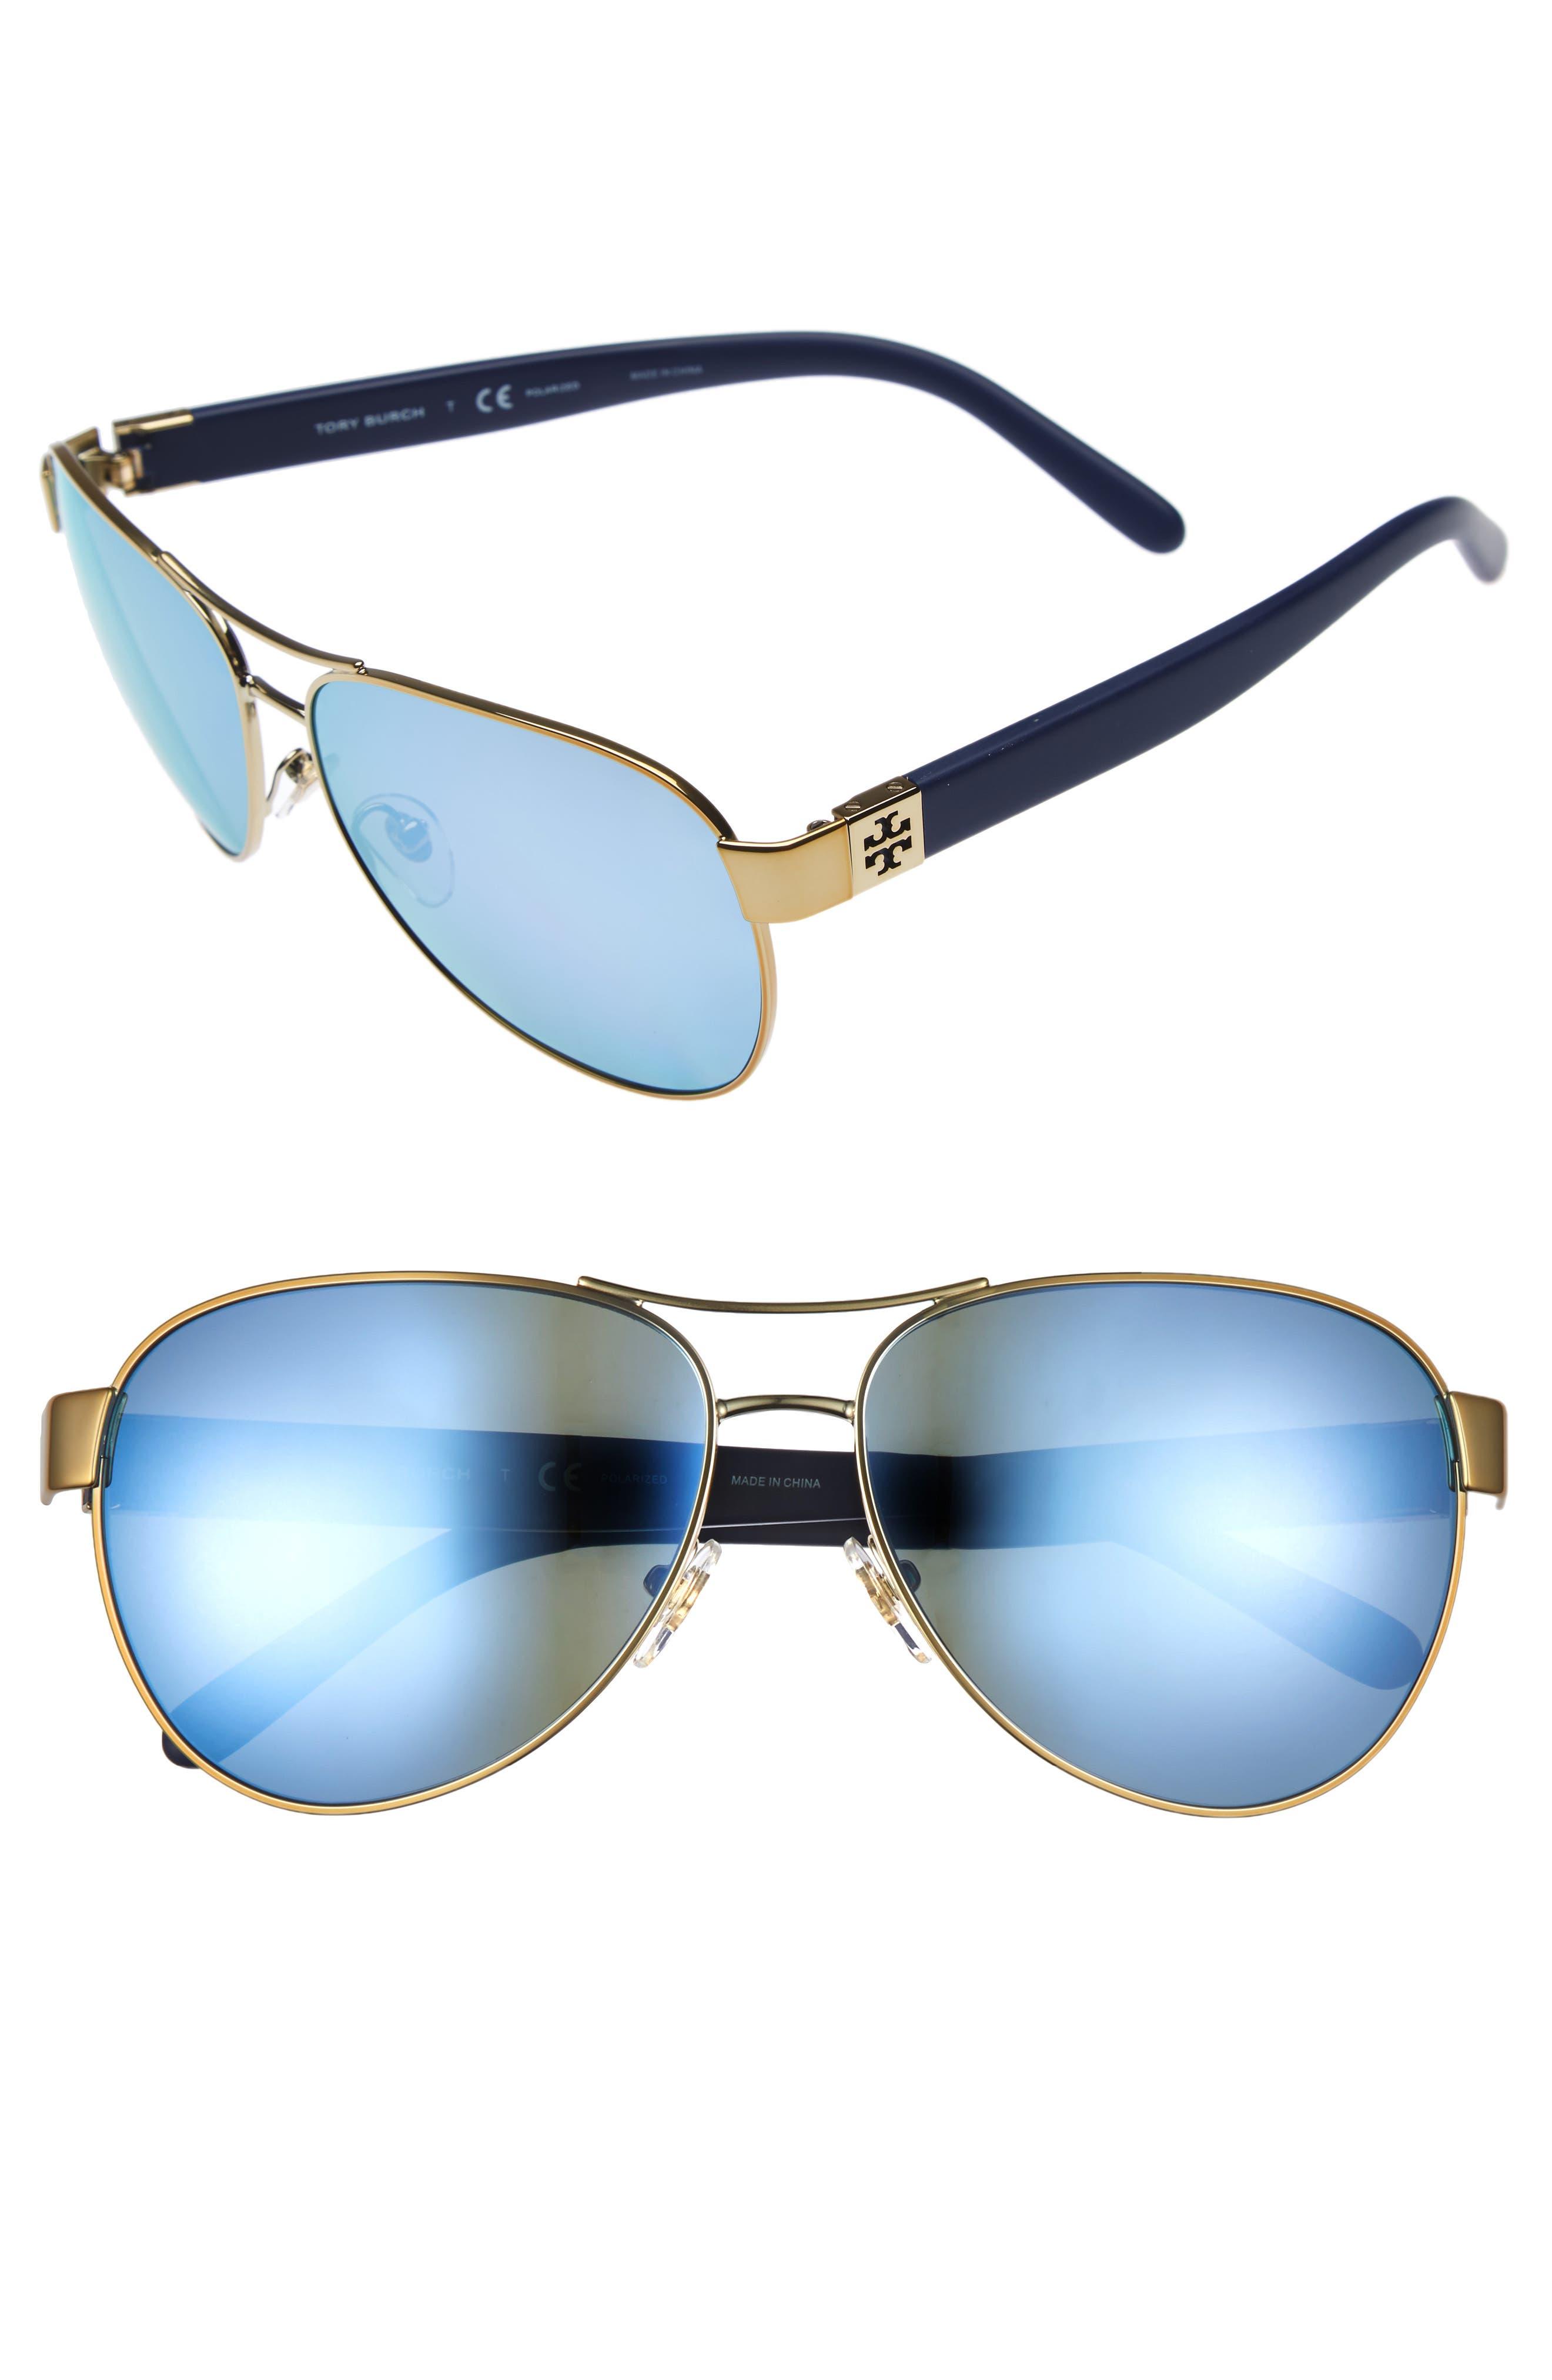 60mm Polarized Aviator Sunglasses,                         Main,                         color, Gold